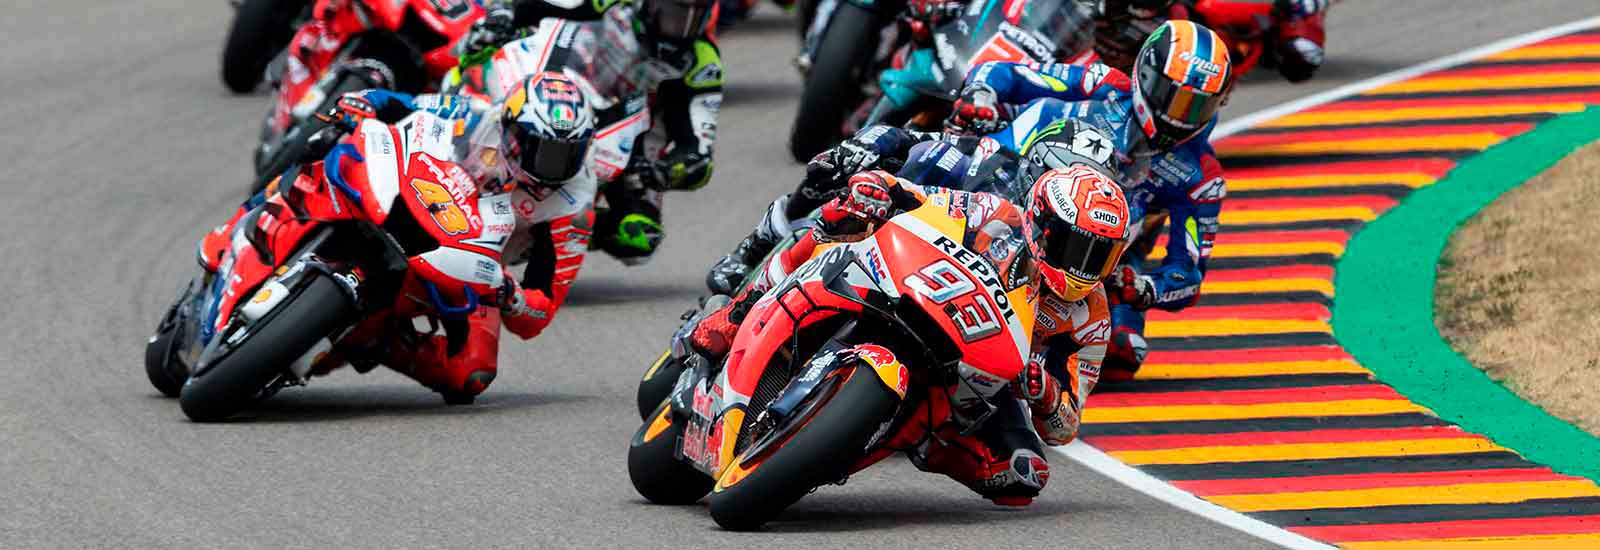 MotoGP Sachsenring 2019 mit TEAMBRENNER (Box Repsol [CC BY 2.0])